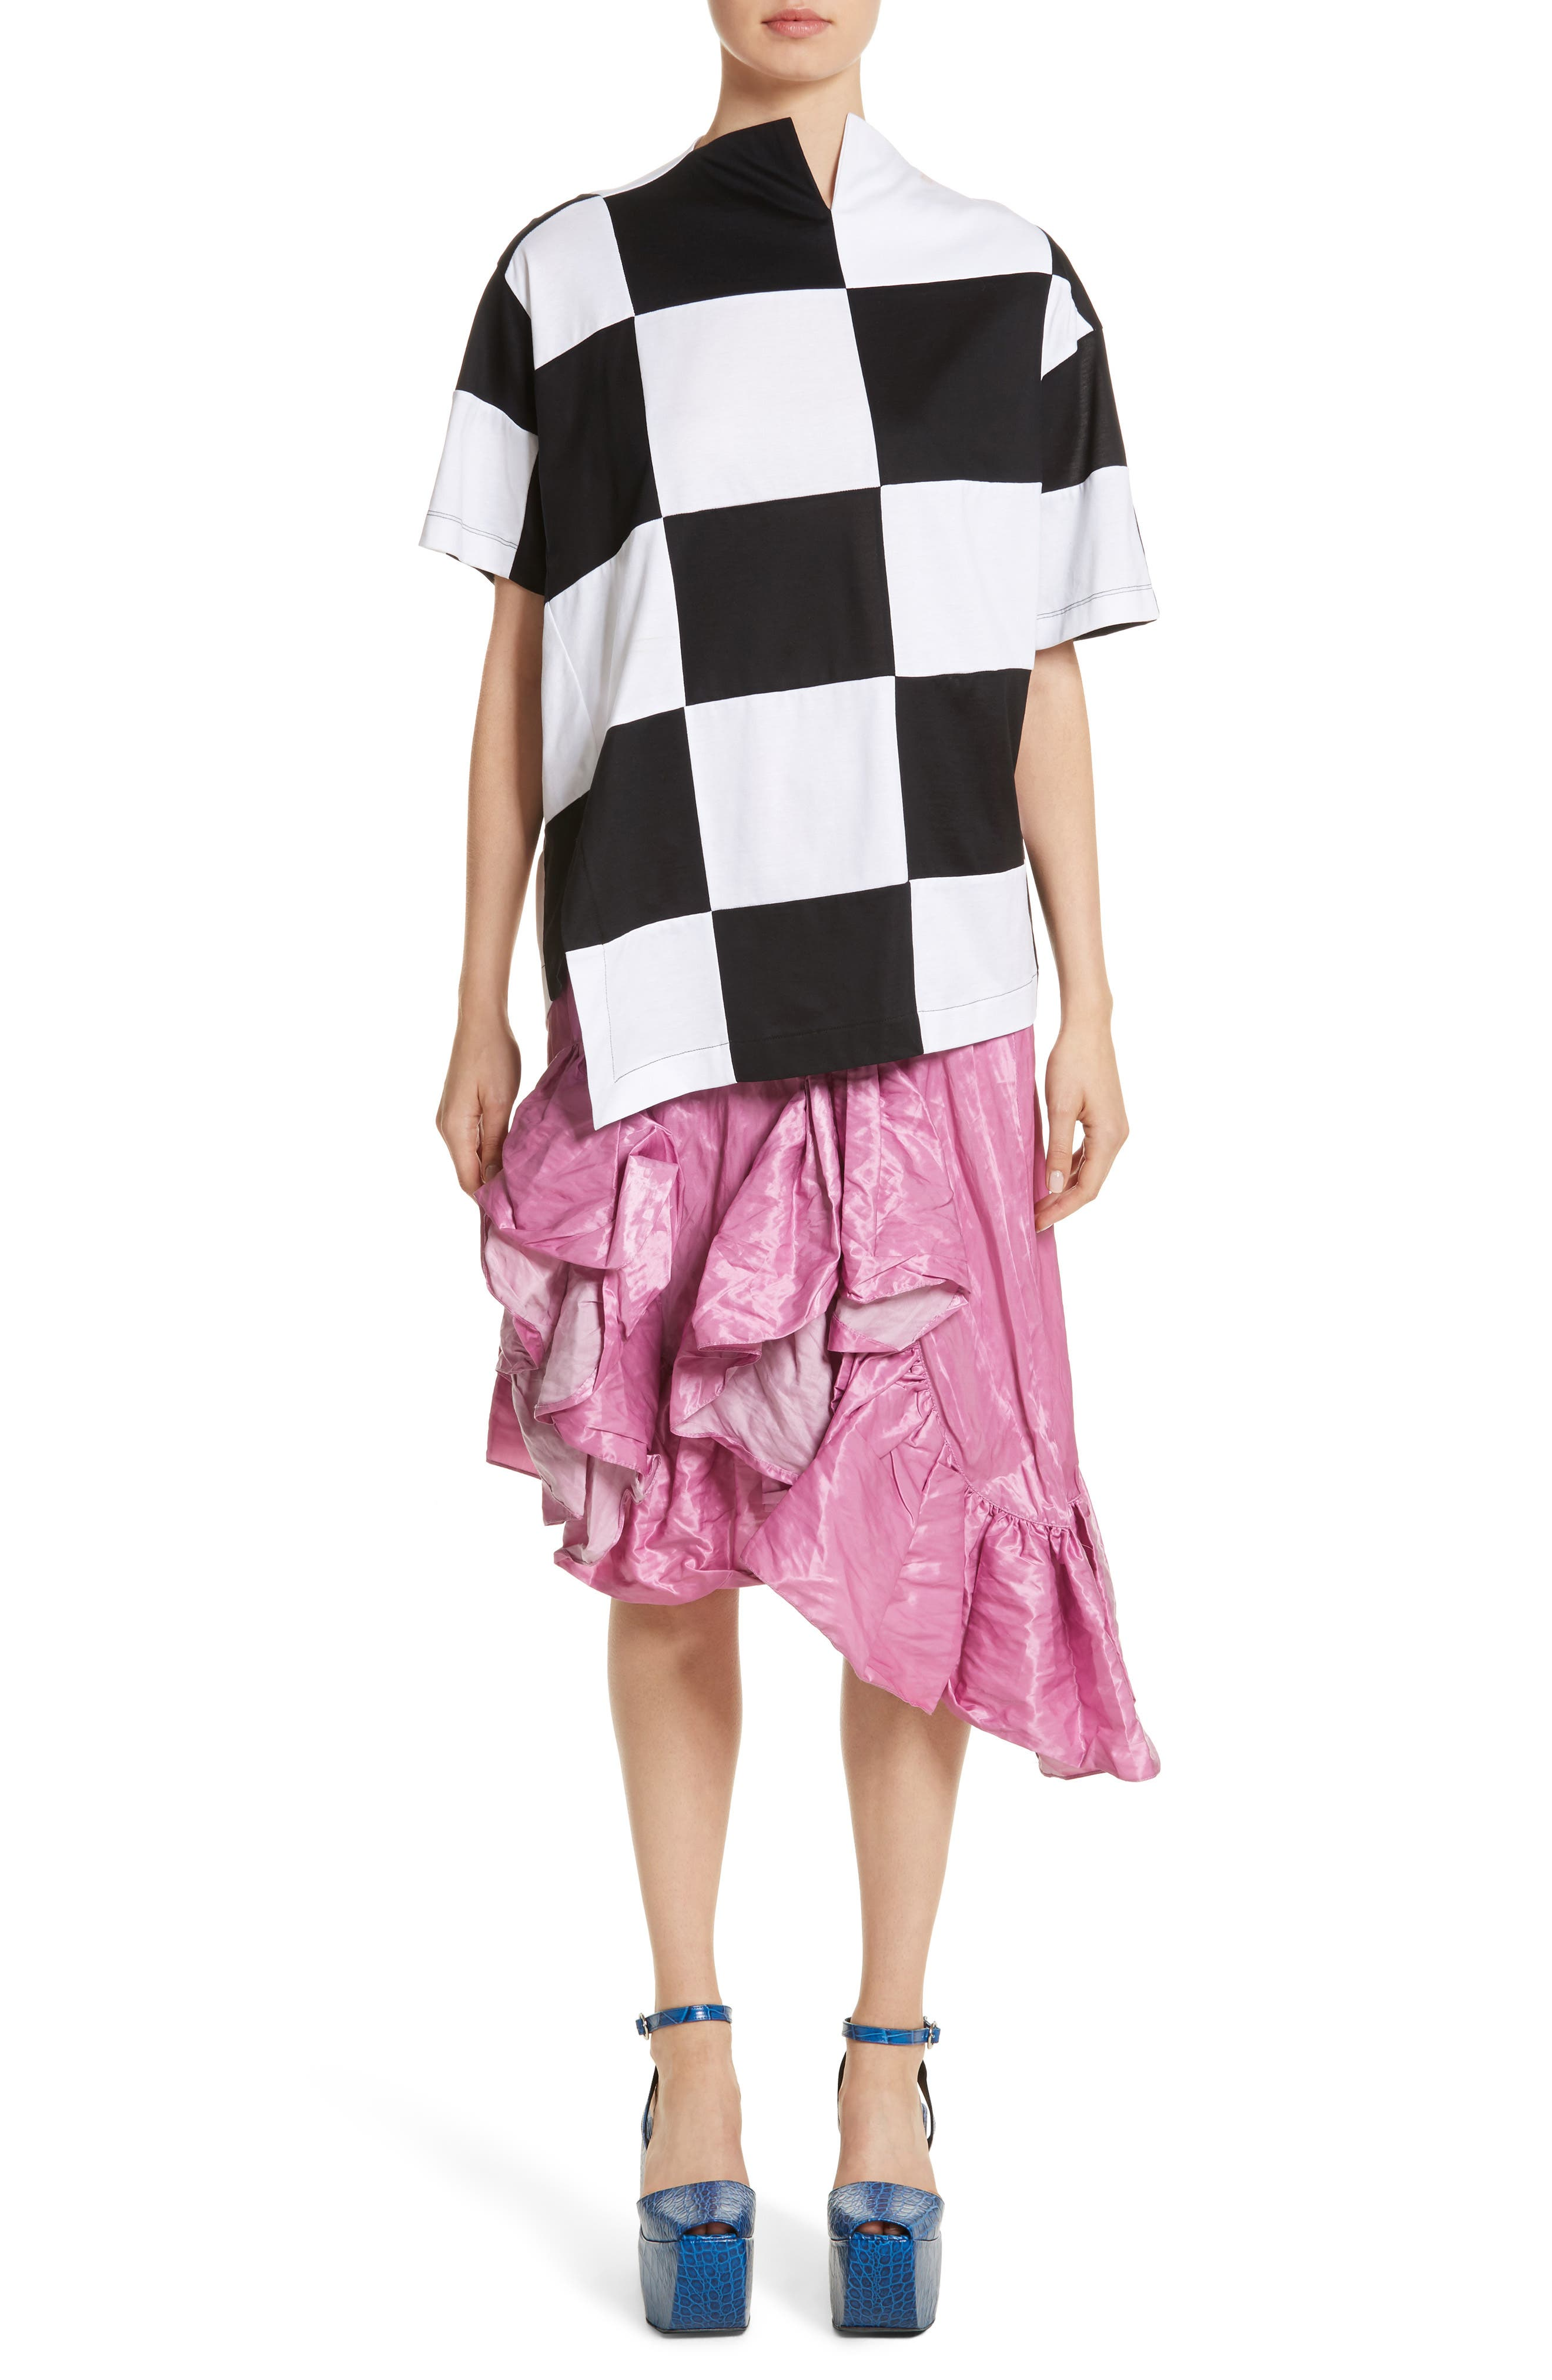 Marques'Almeida Asymmetrical Ruffle Taffeta Skirt,                             Alternate thumbnail 7, color,                             650